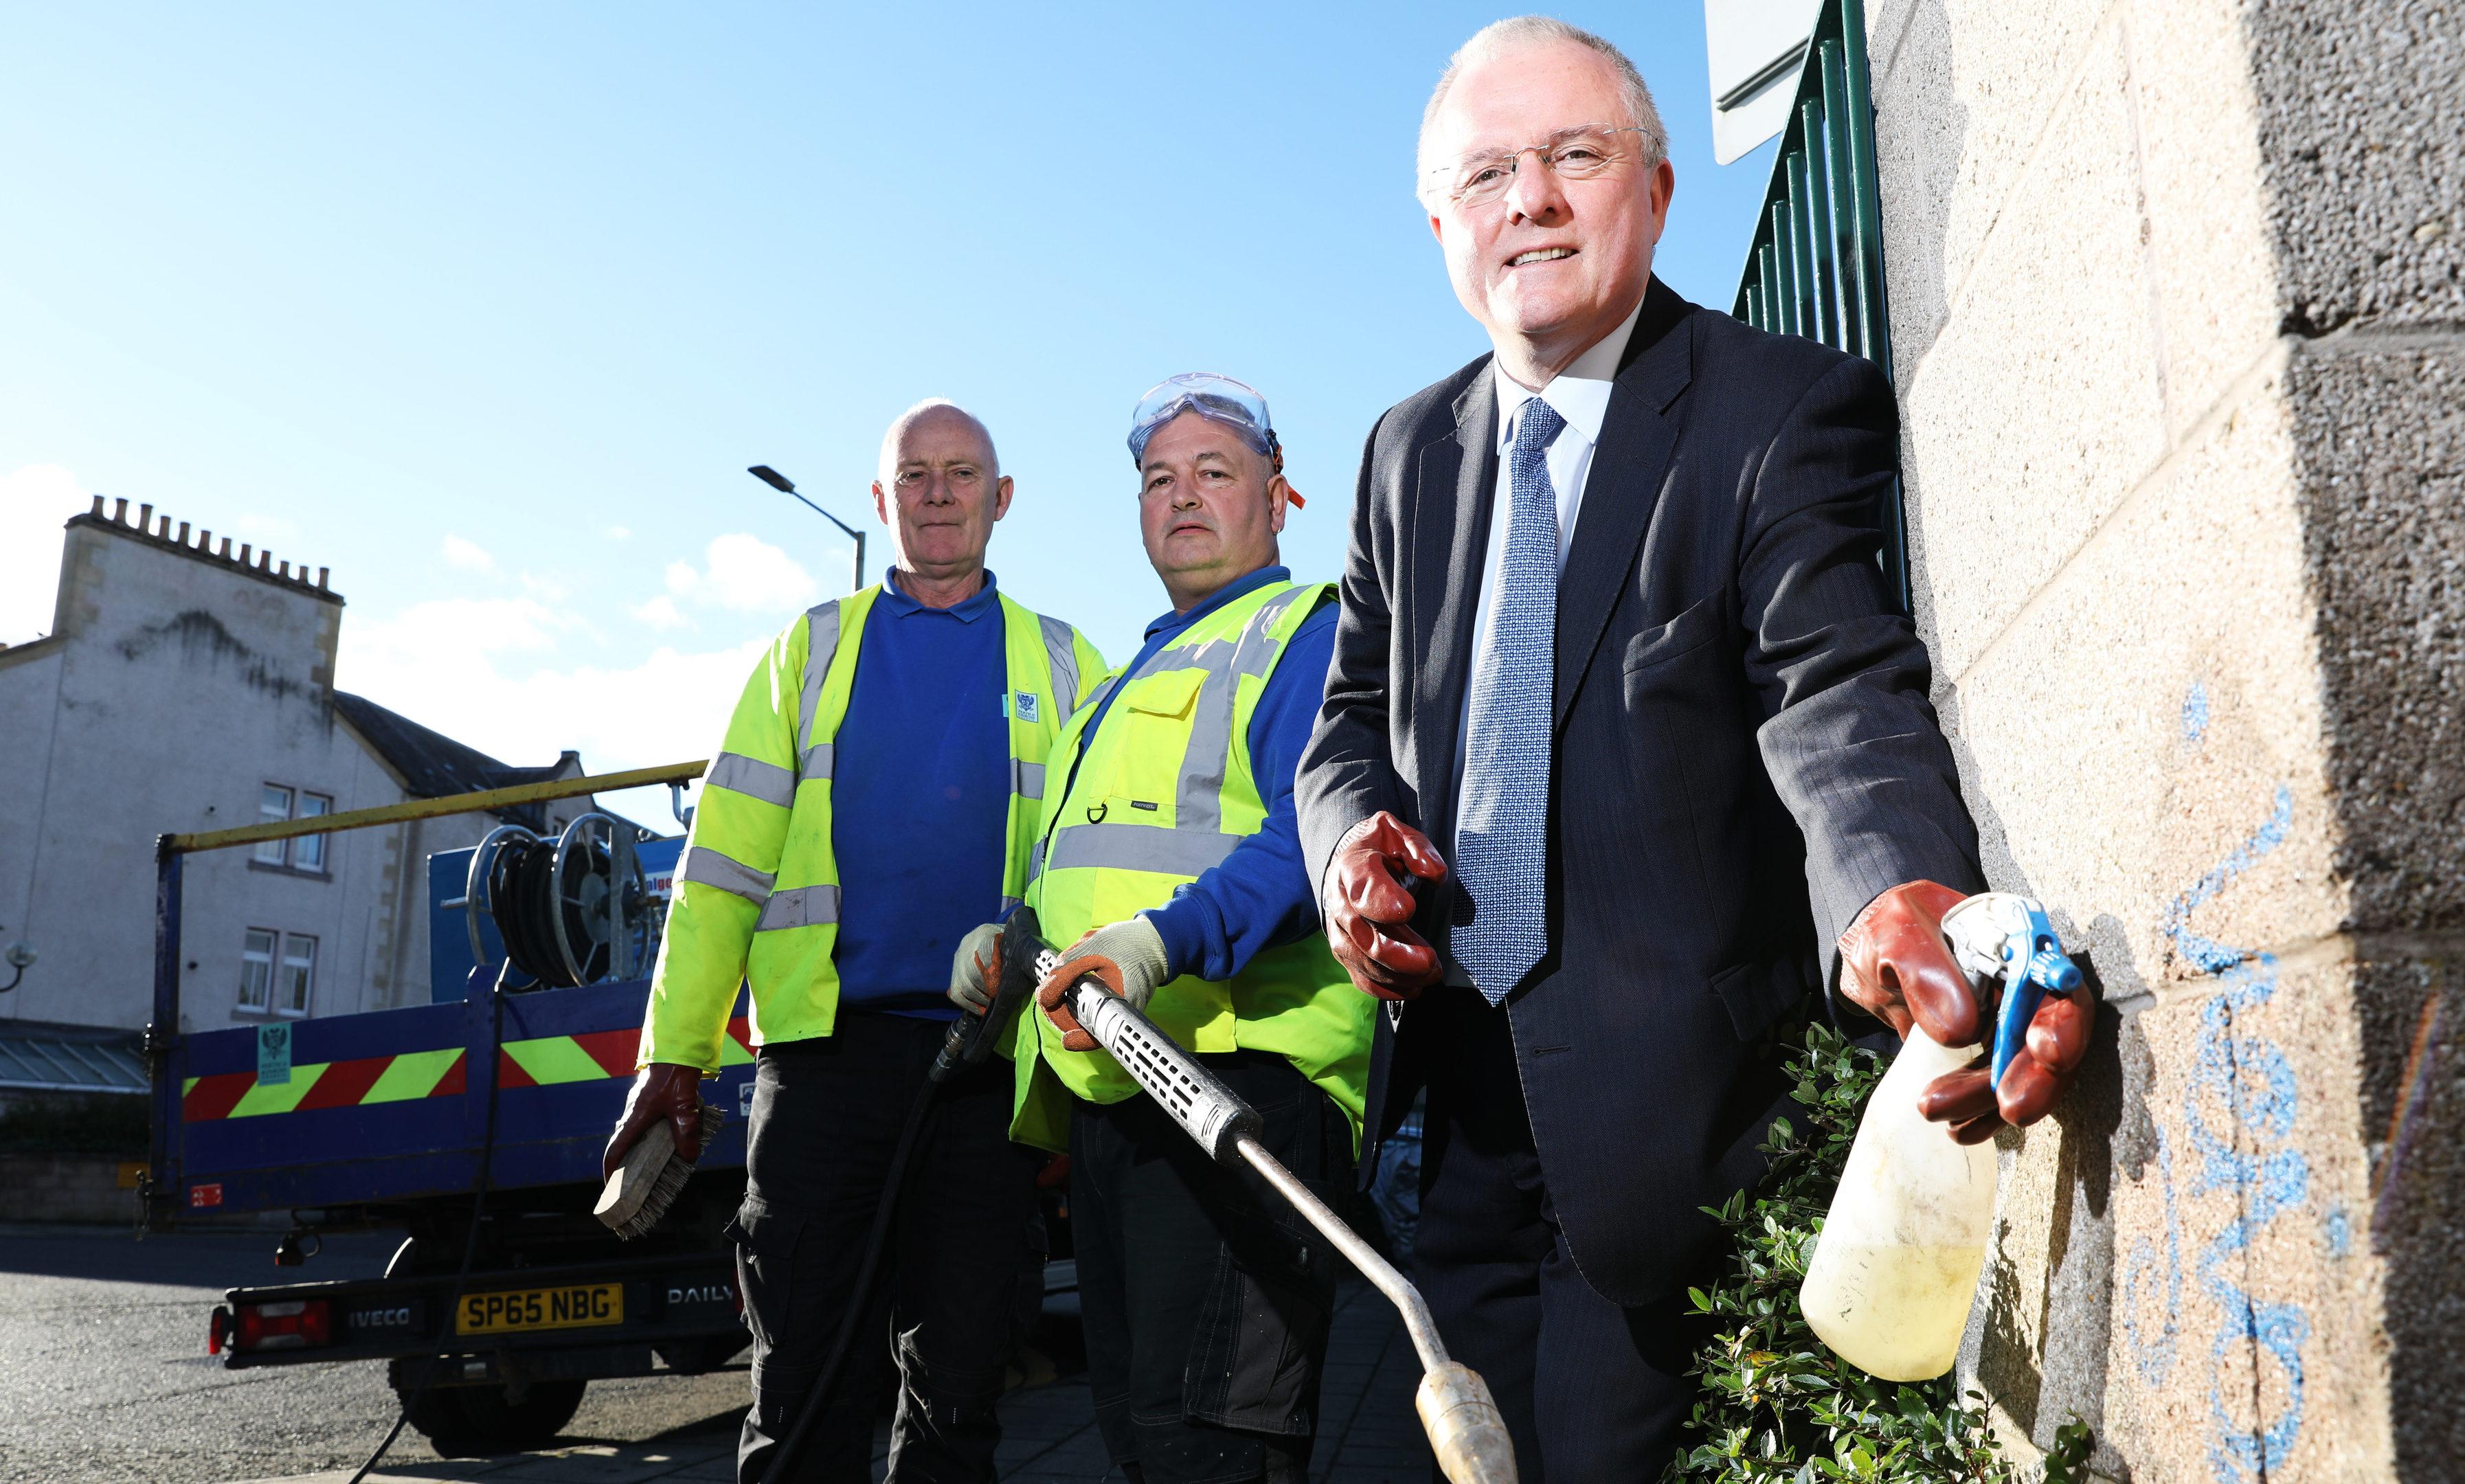 Peter Barrett helping clean up graffiti in the city.